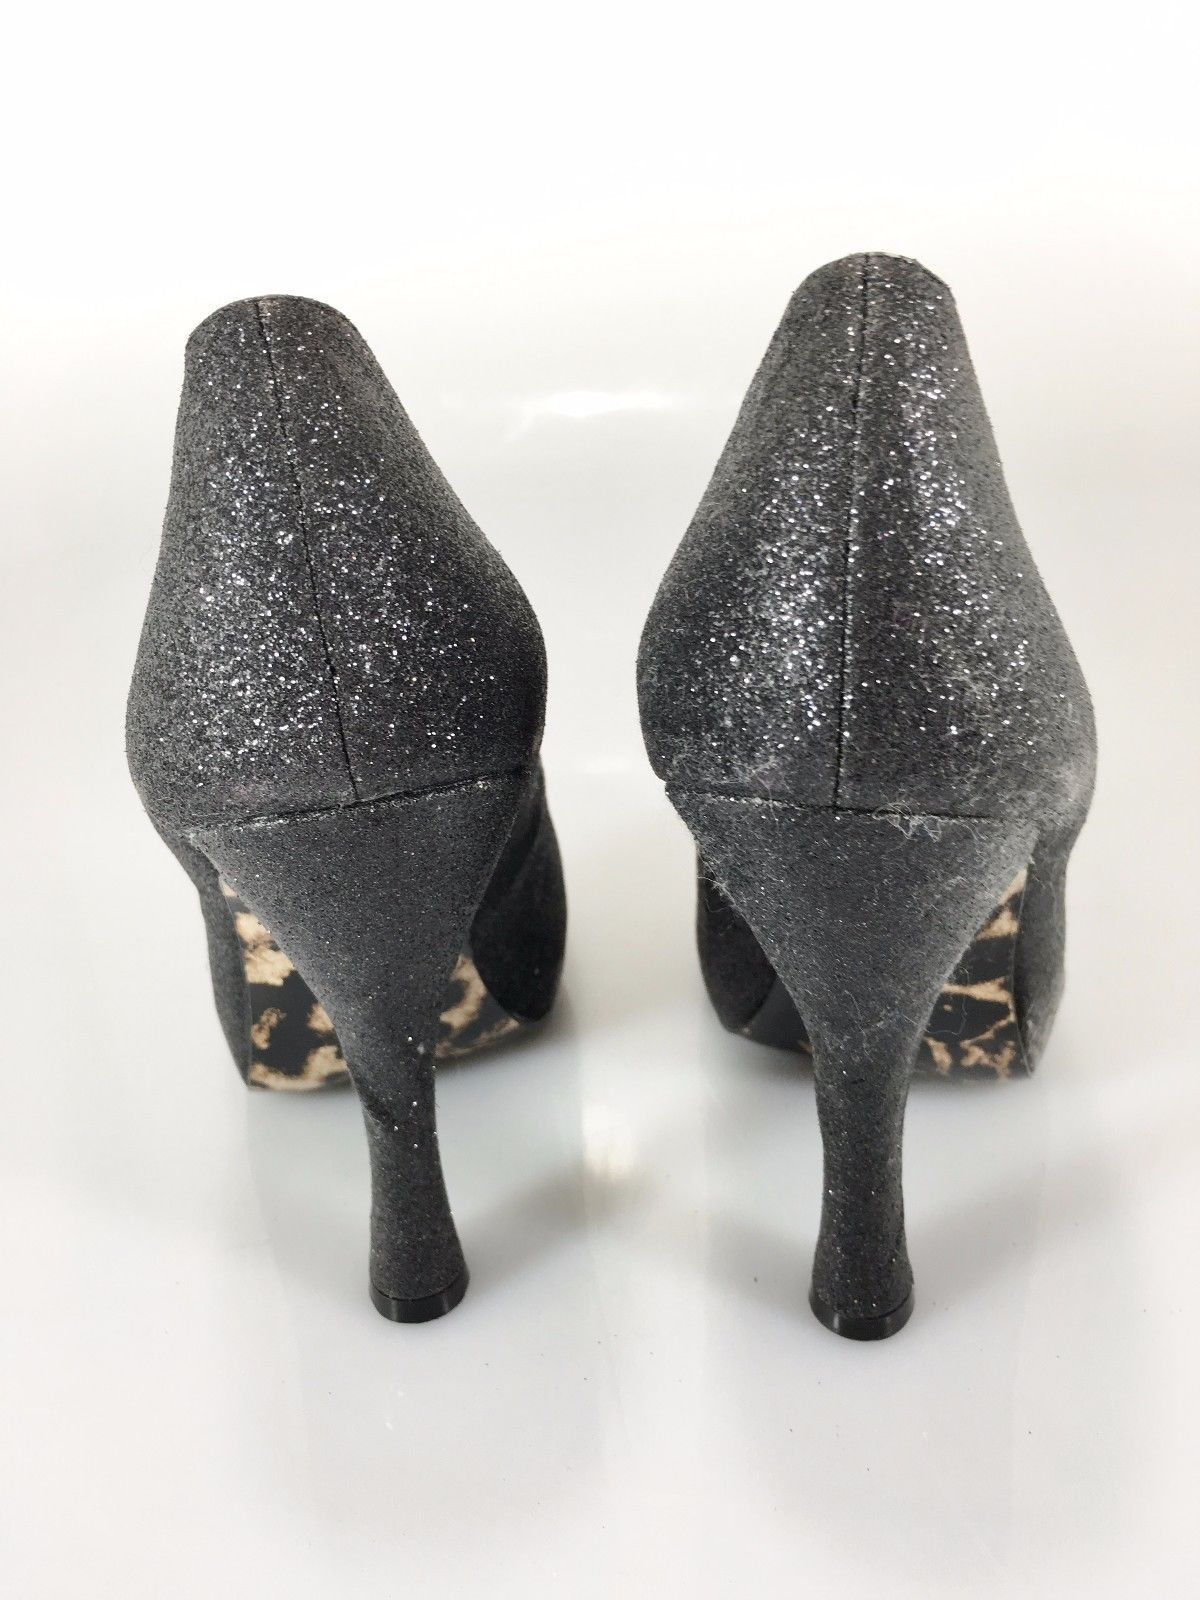 "Betsey Johnson Womens 6.5 Tastty-G Black Glitter 5"" Stiletto Pumps Shoes NEW"